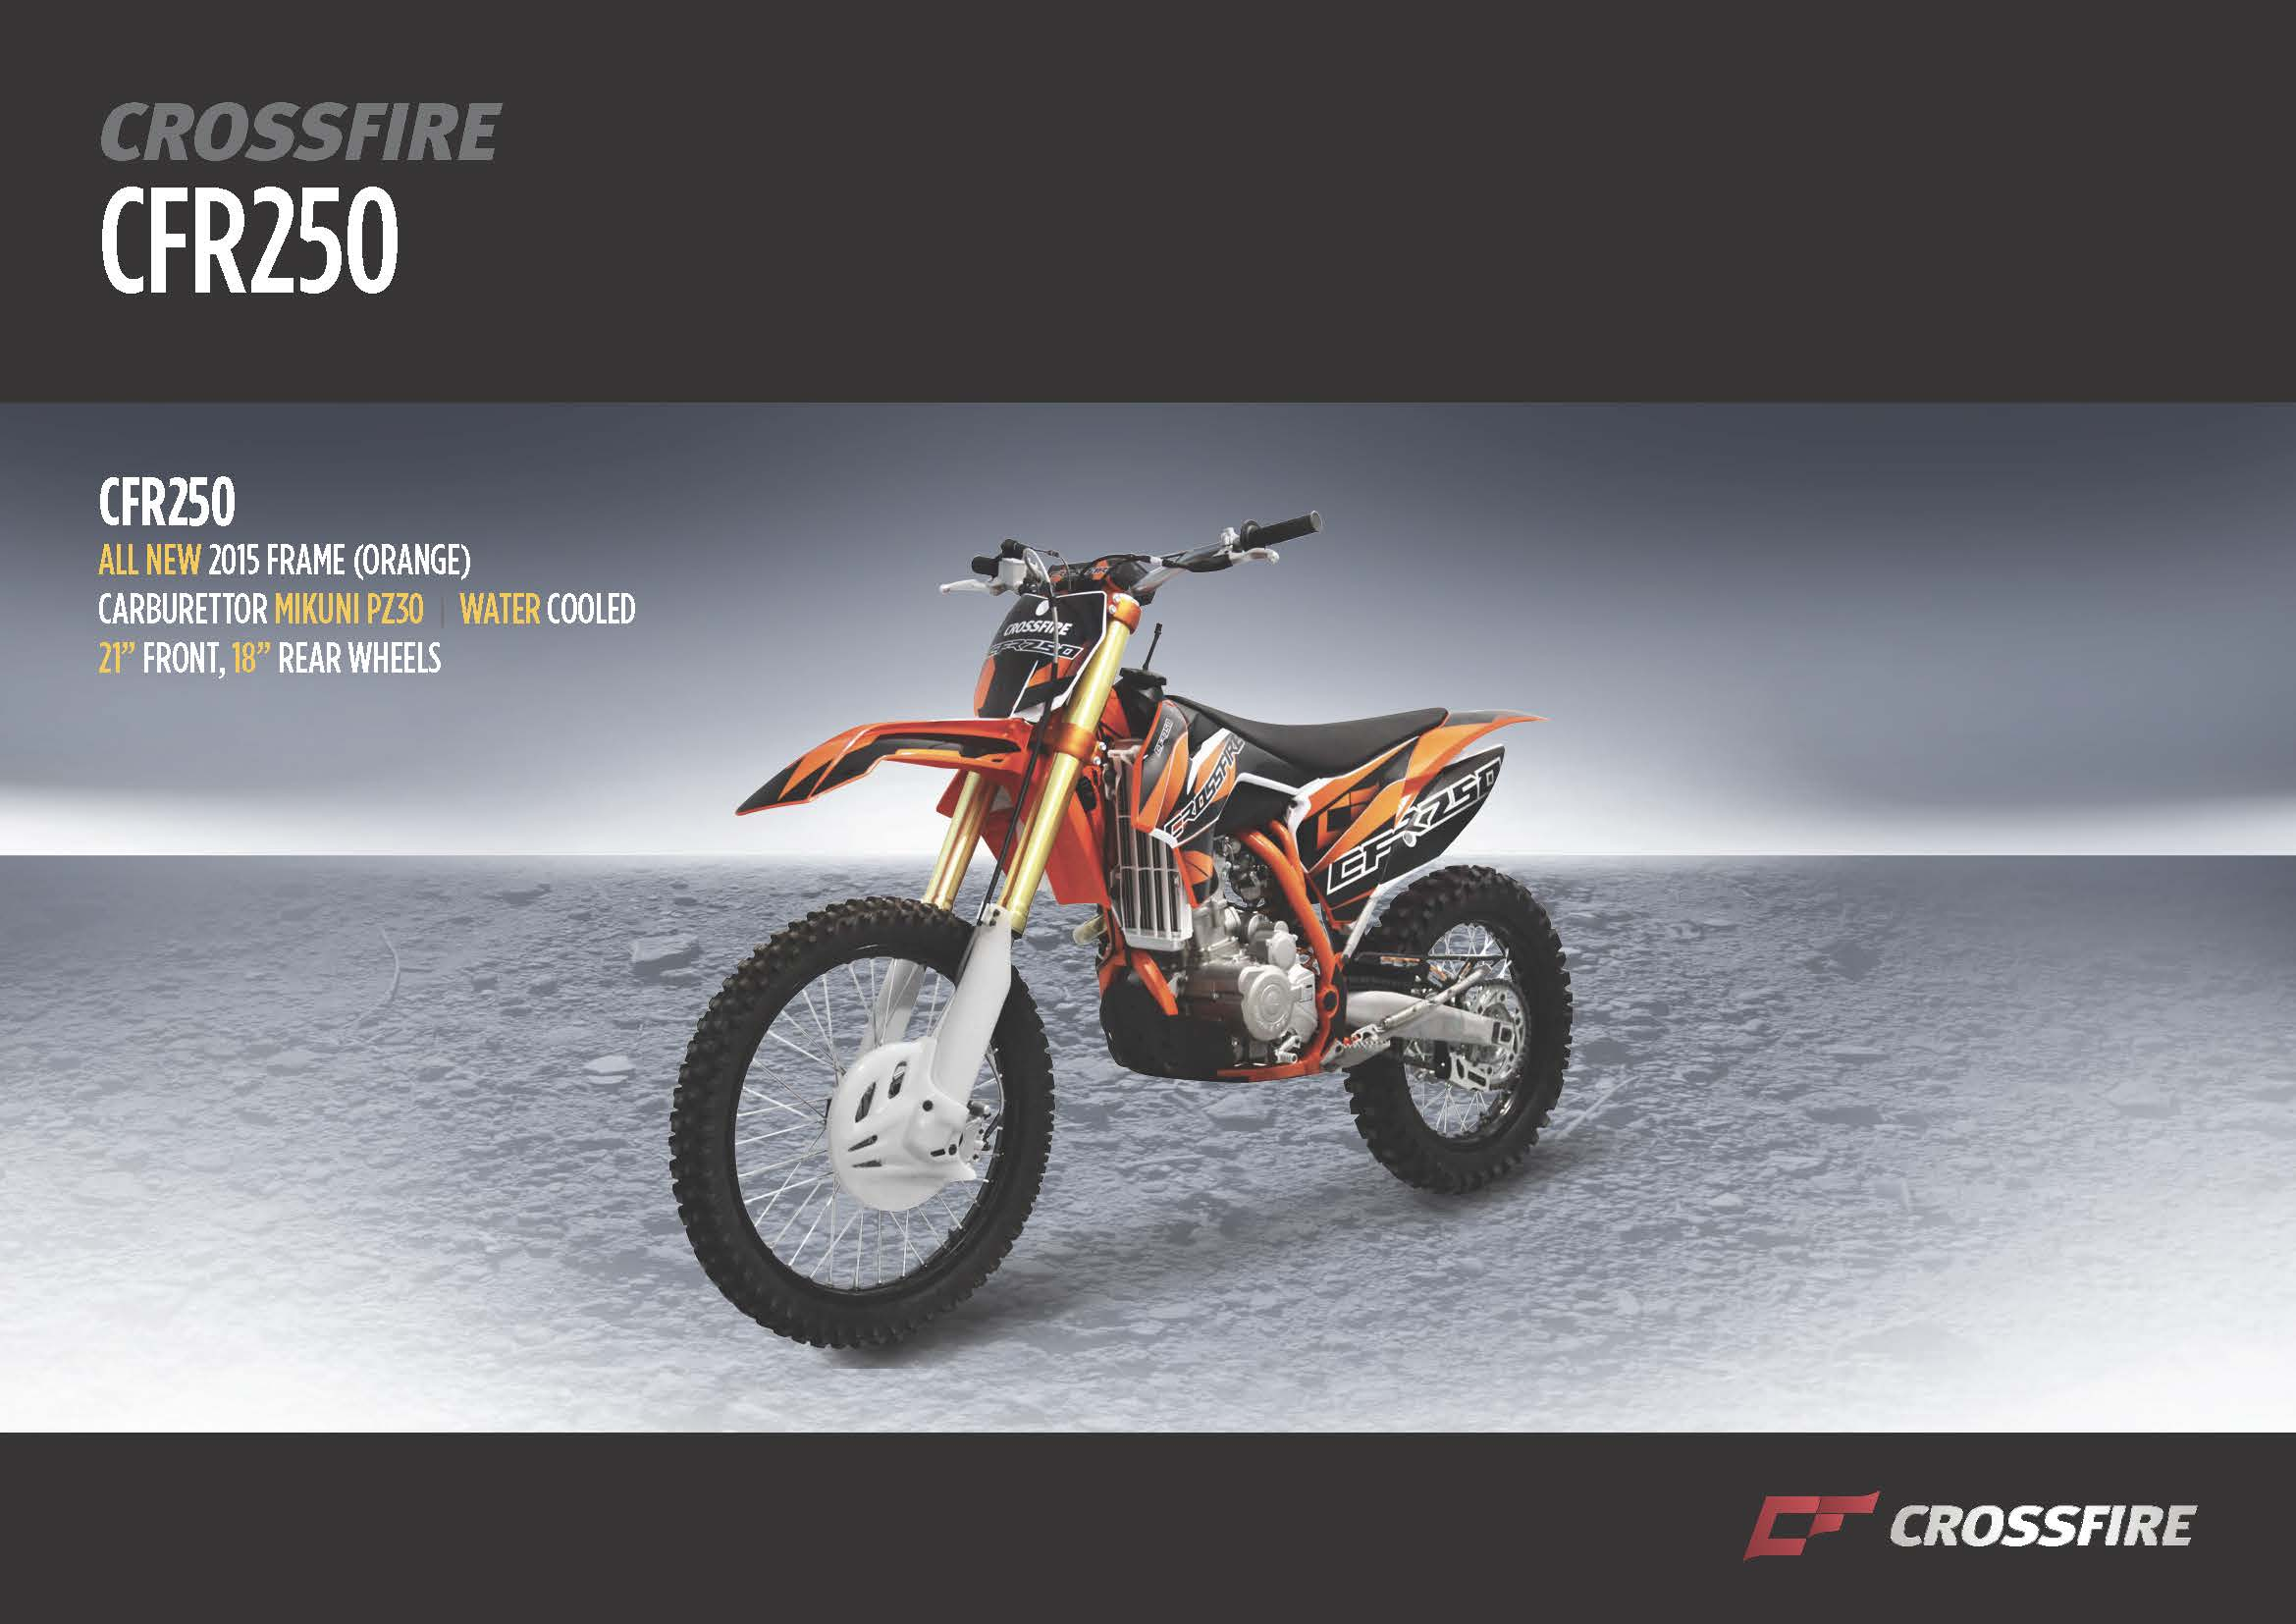 Crossfire CFR250 Brochure Front - dirt bikes store warwick